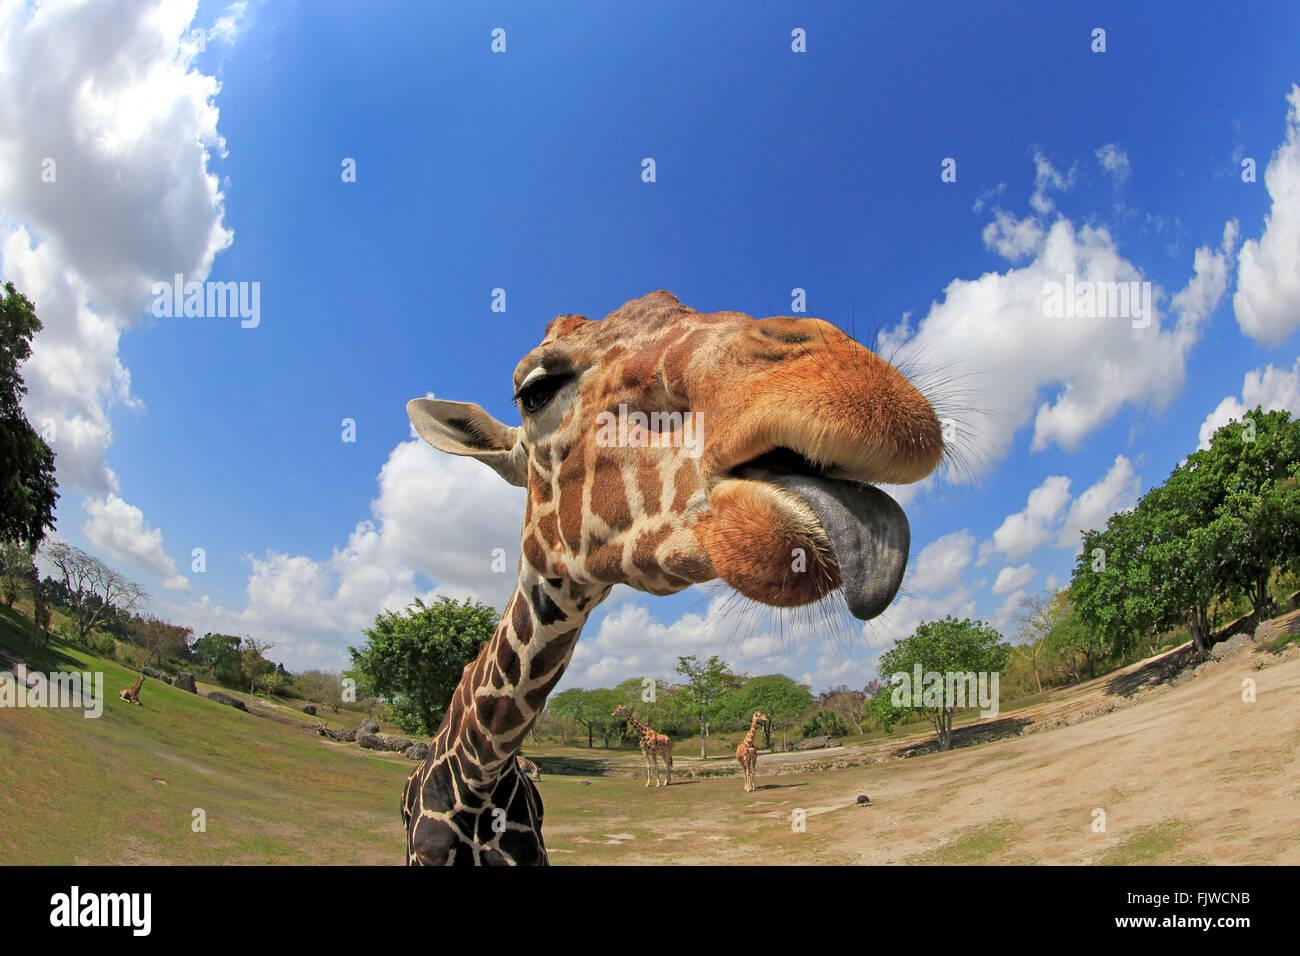 Retikuliert Giraffe, Erwachsene Porträt, Afrika / (Giraffa Plancius Reticulata) Stockfoto